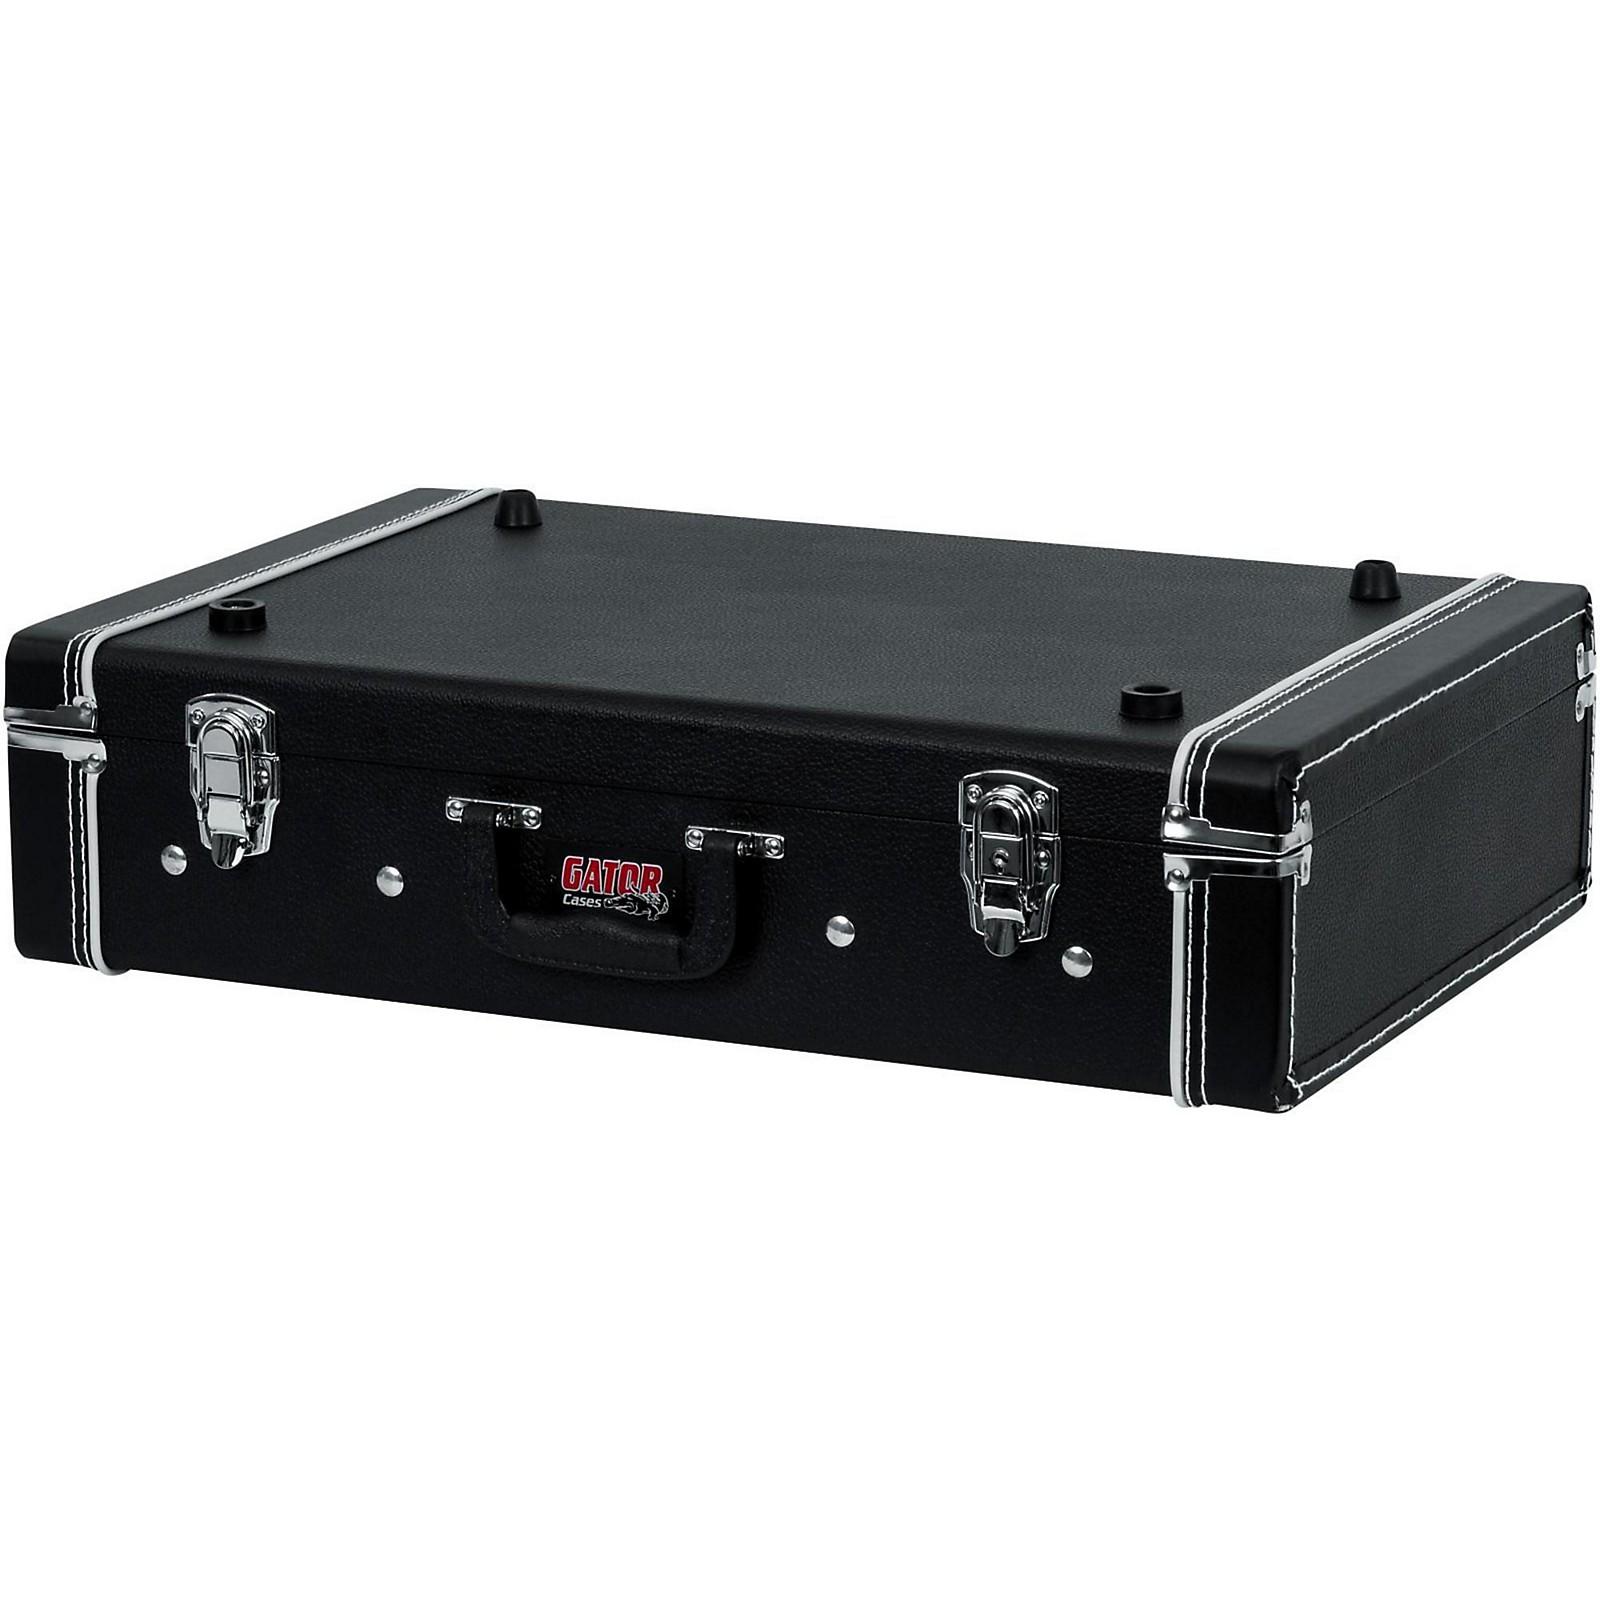 Open Box Gator Gig-Box Jr. Pedal Board/Guitar Stand Case